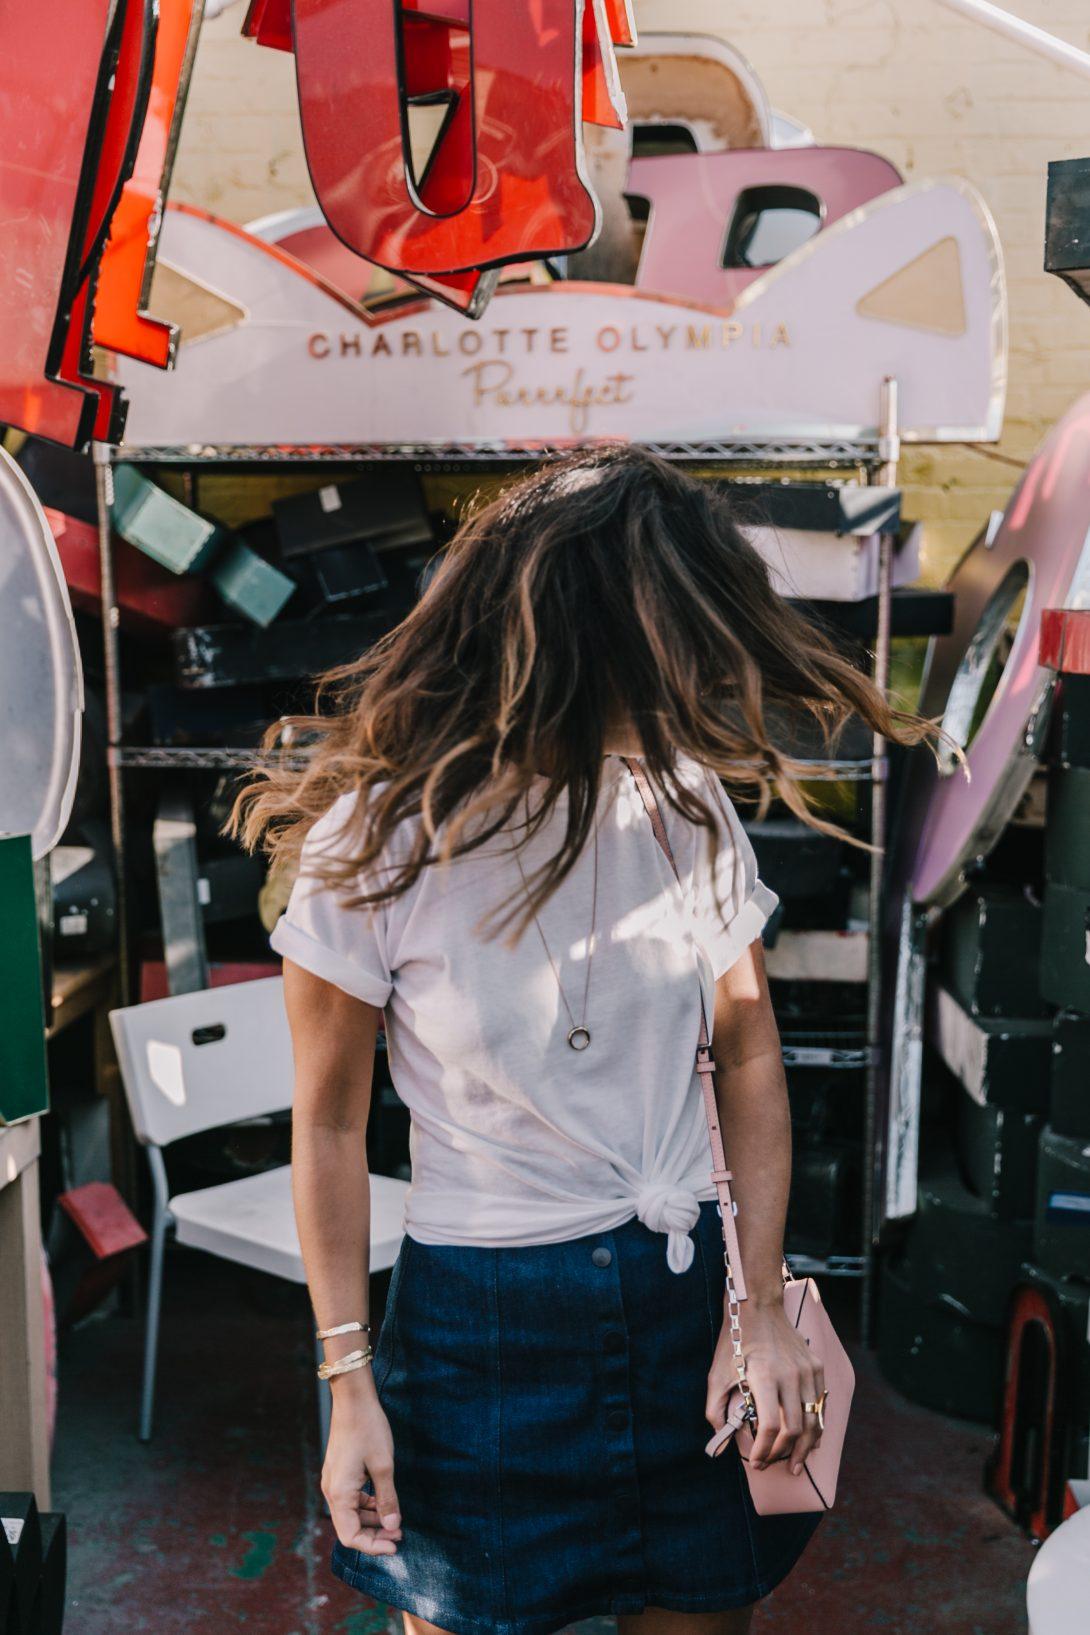 Calvin_Klein-Denim_Skirt-CK_Collection-Los_Angeles-Nick_Metropolis-Saint_Laurent_Sneakers-Pink_Bag-Outfit-Collage_Vintage--16